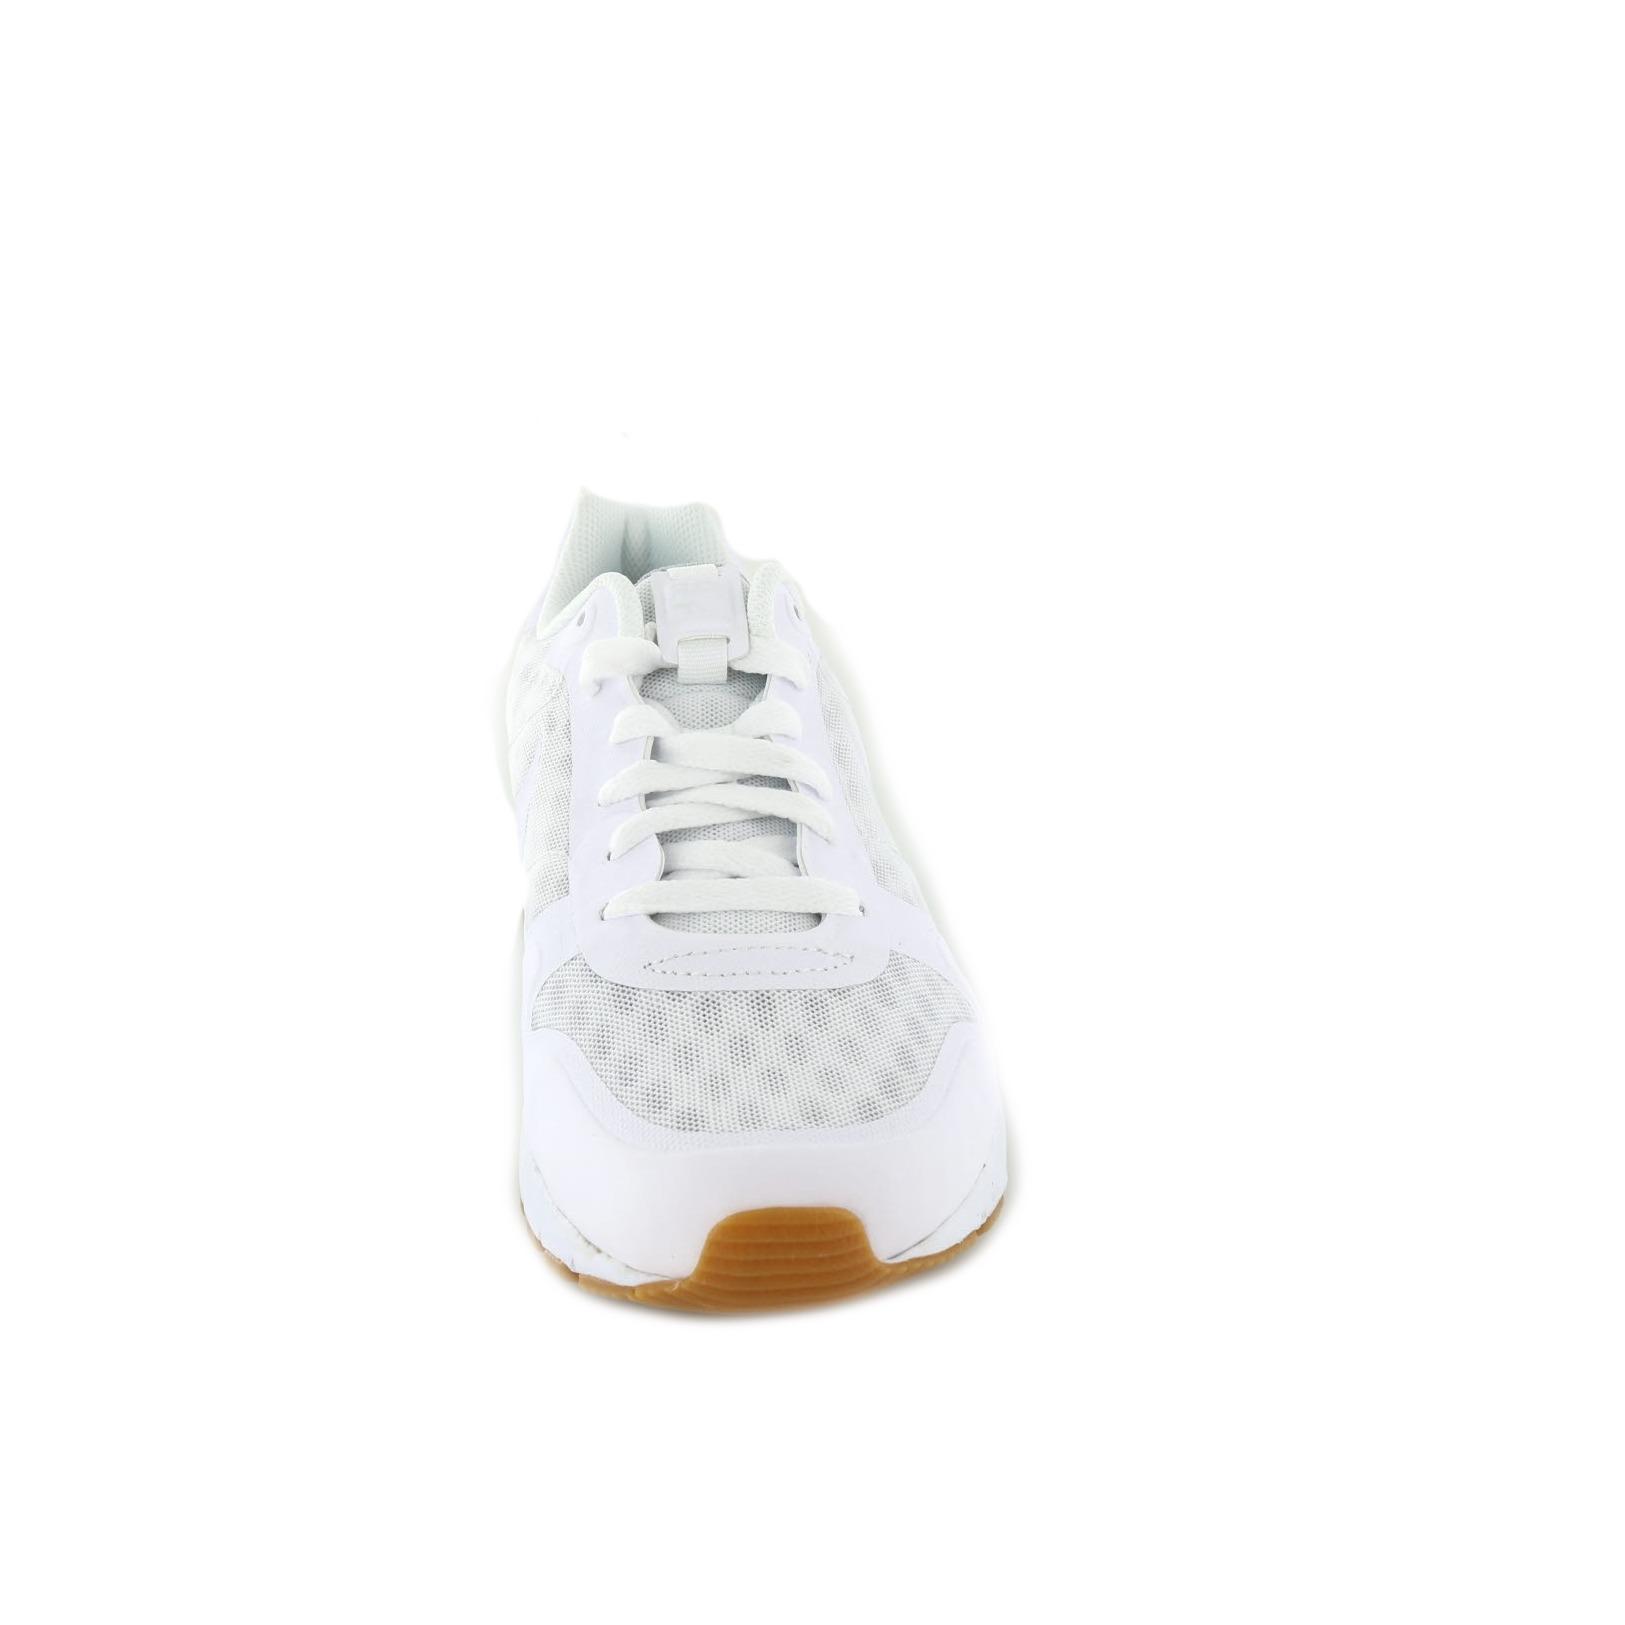 Nike / Pizzo Scarpe - Scarpe Da Ginnastica, Bianco